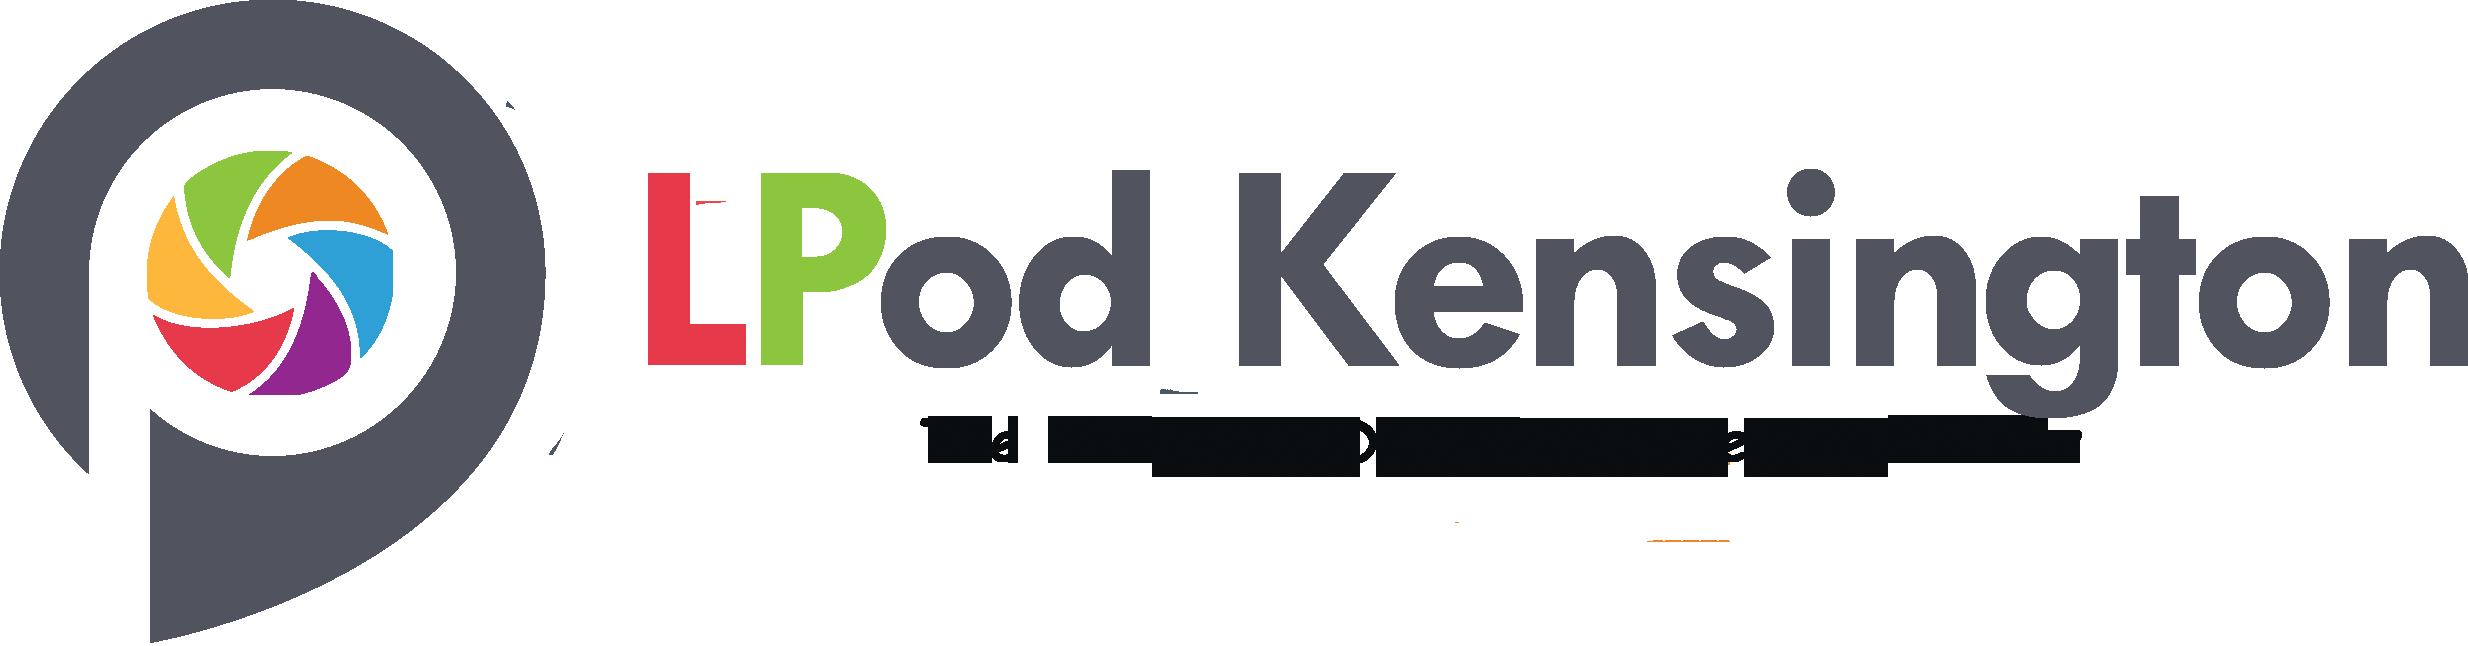 intensive driving courses kensington, one week driving courses kensington, fast pass driving courses kensington